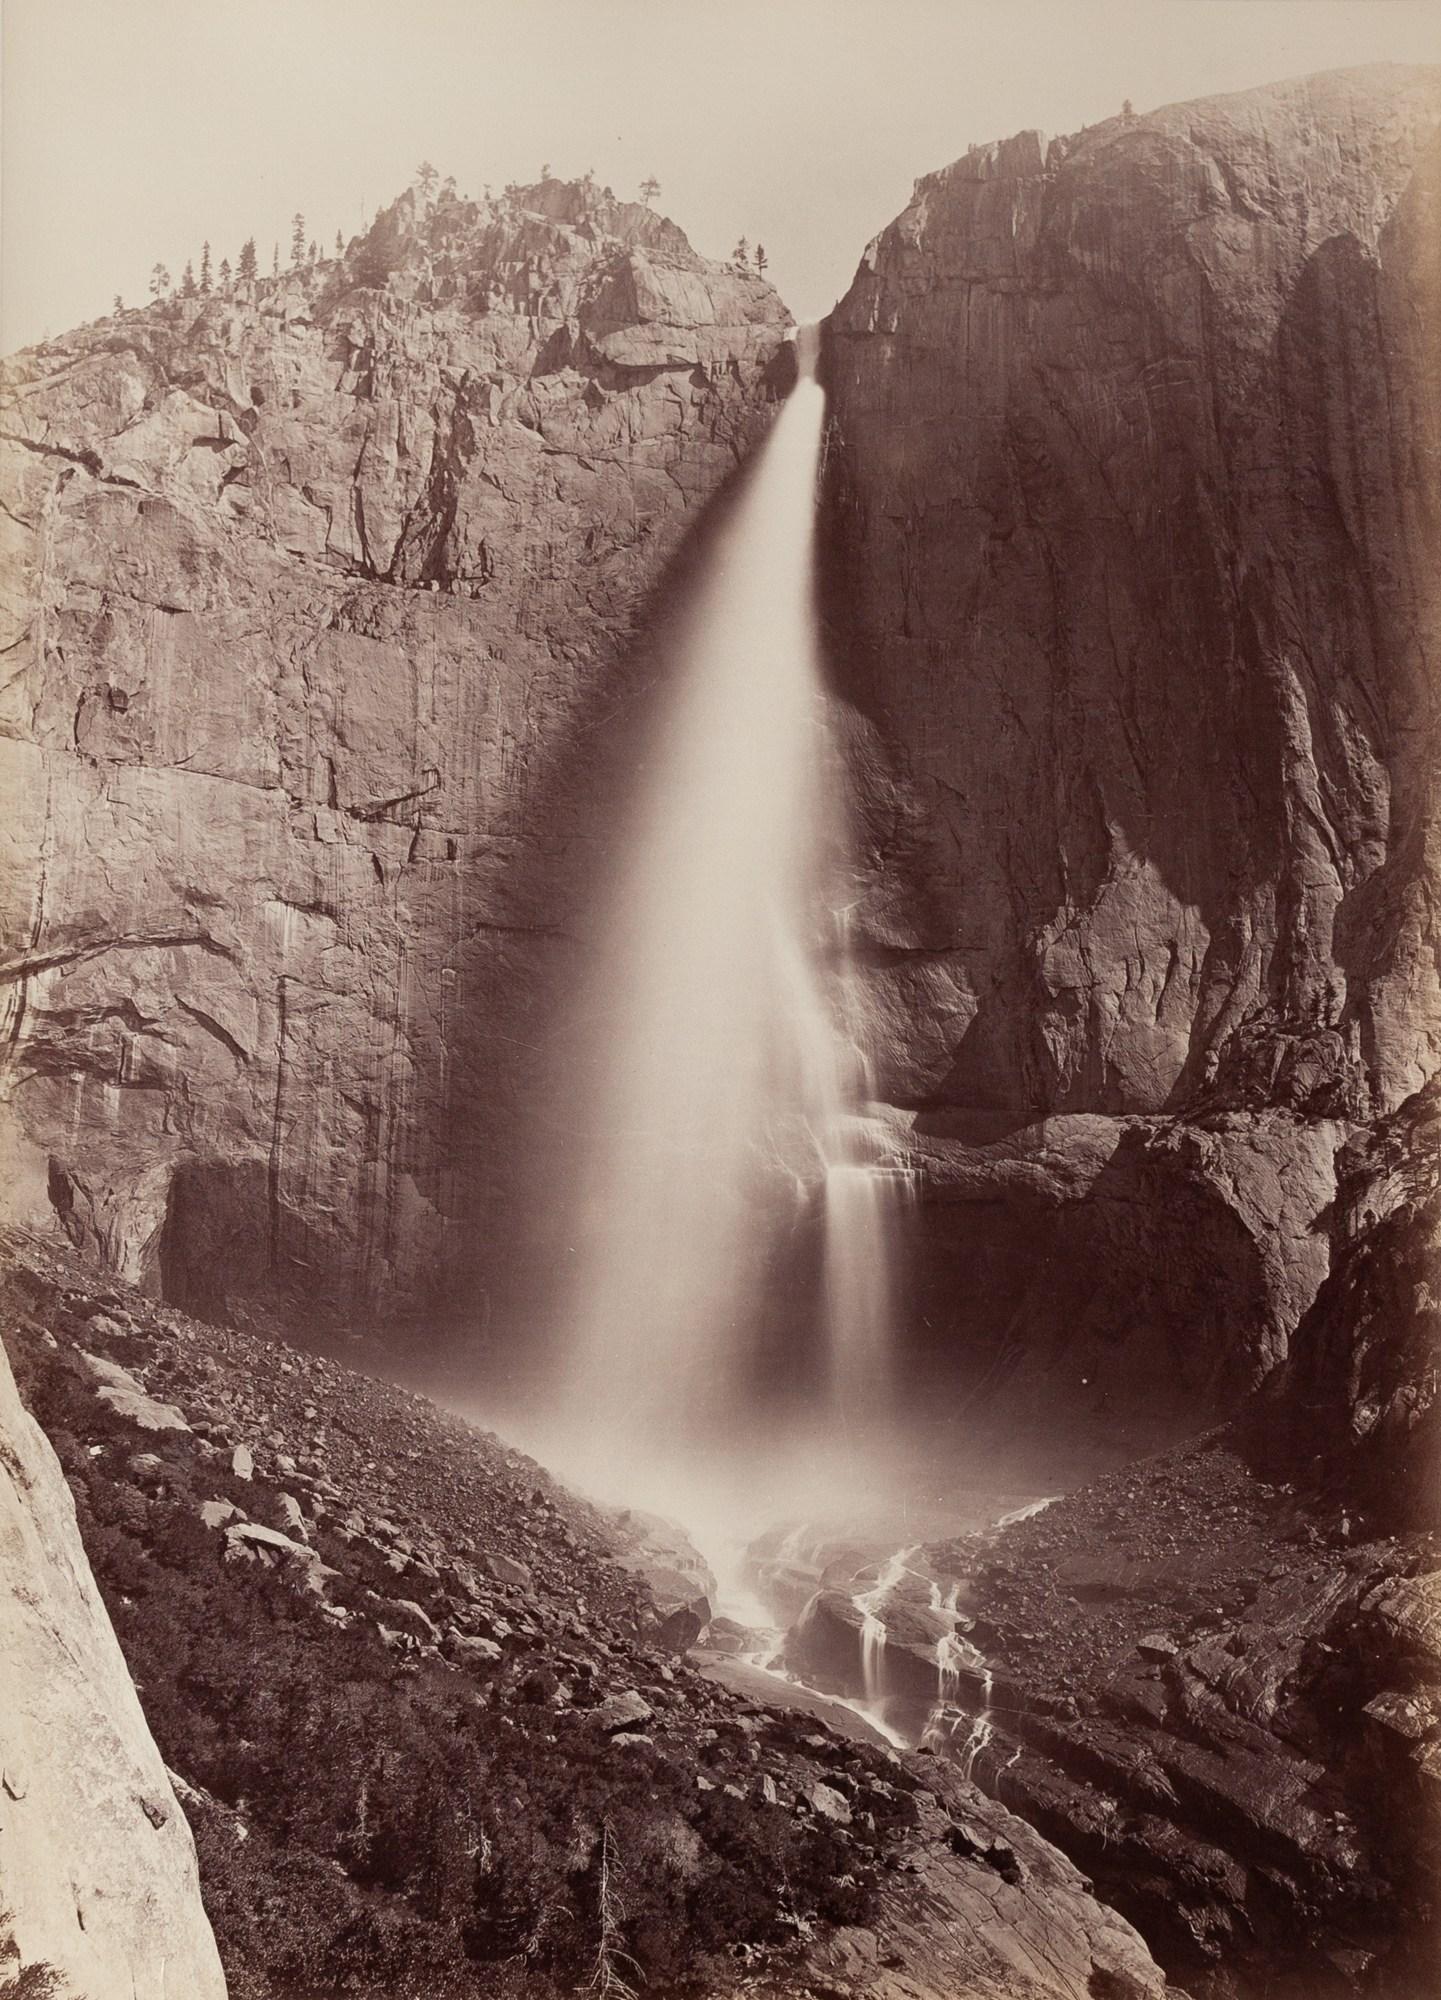 Carleton E. Watkins, Upper Yosemite Falls, 1600 Ft. View from Eagle Point Trail, Yosemite, 1878-81